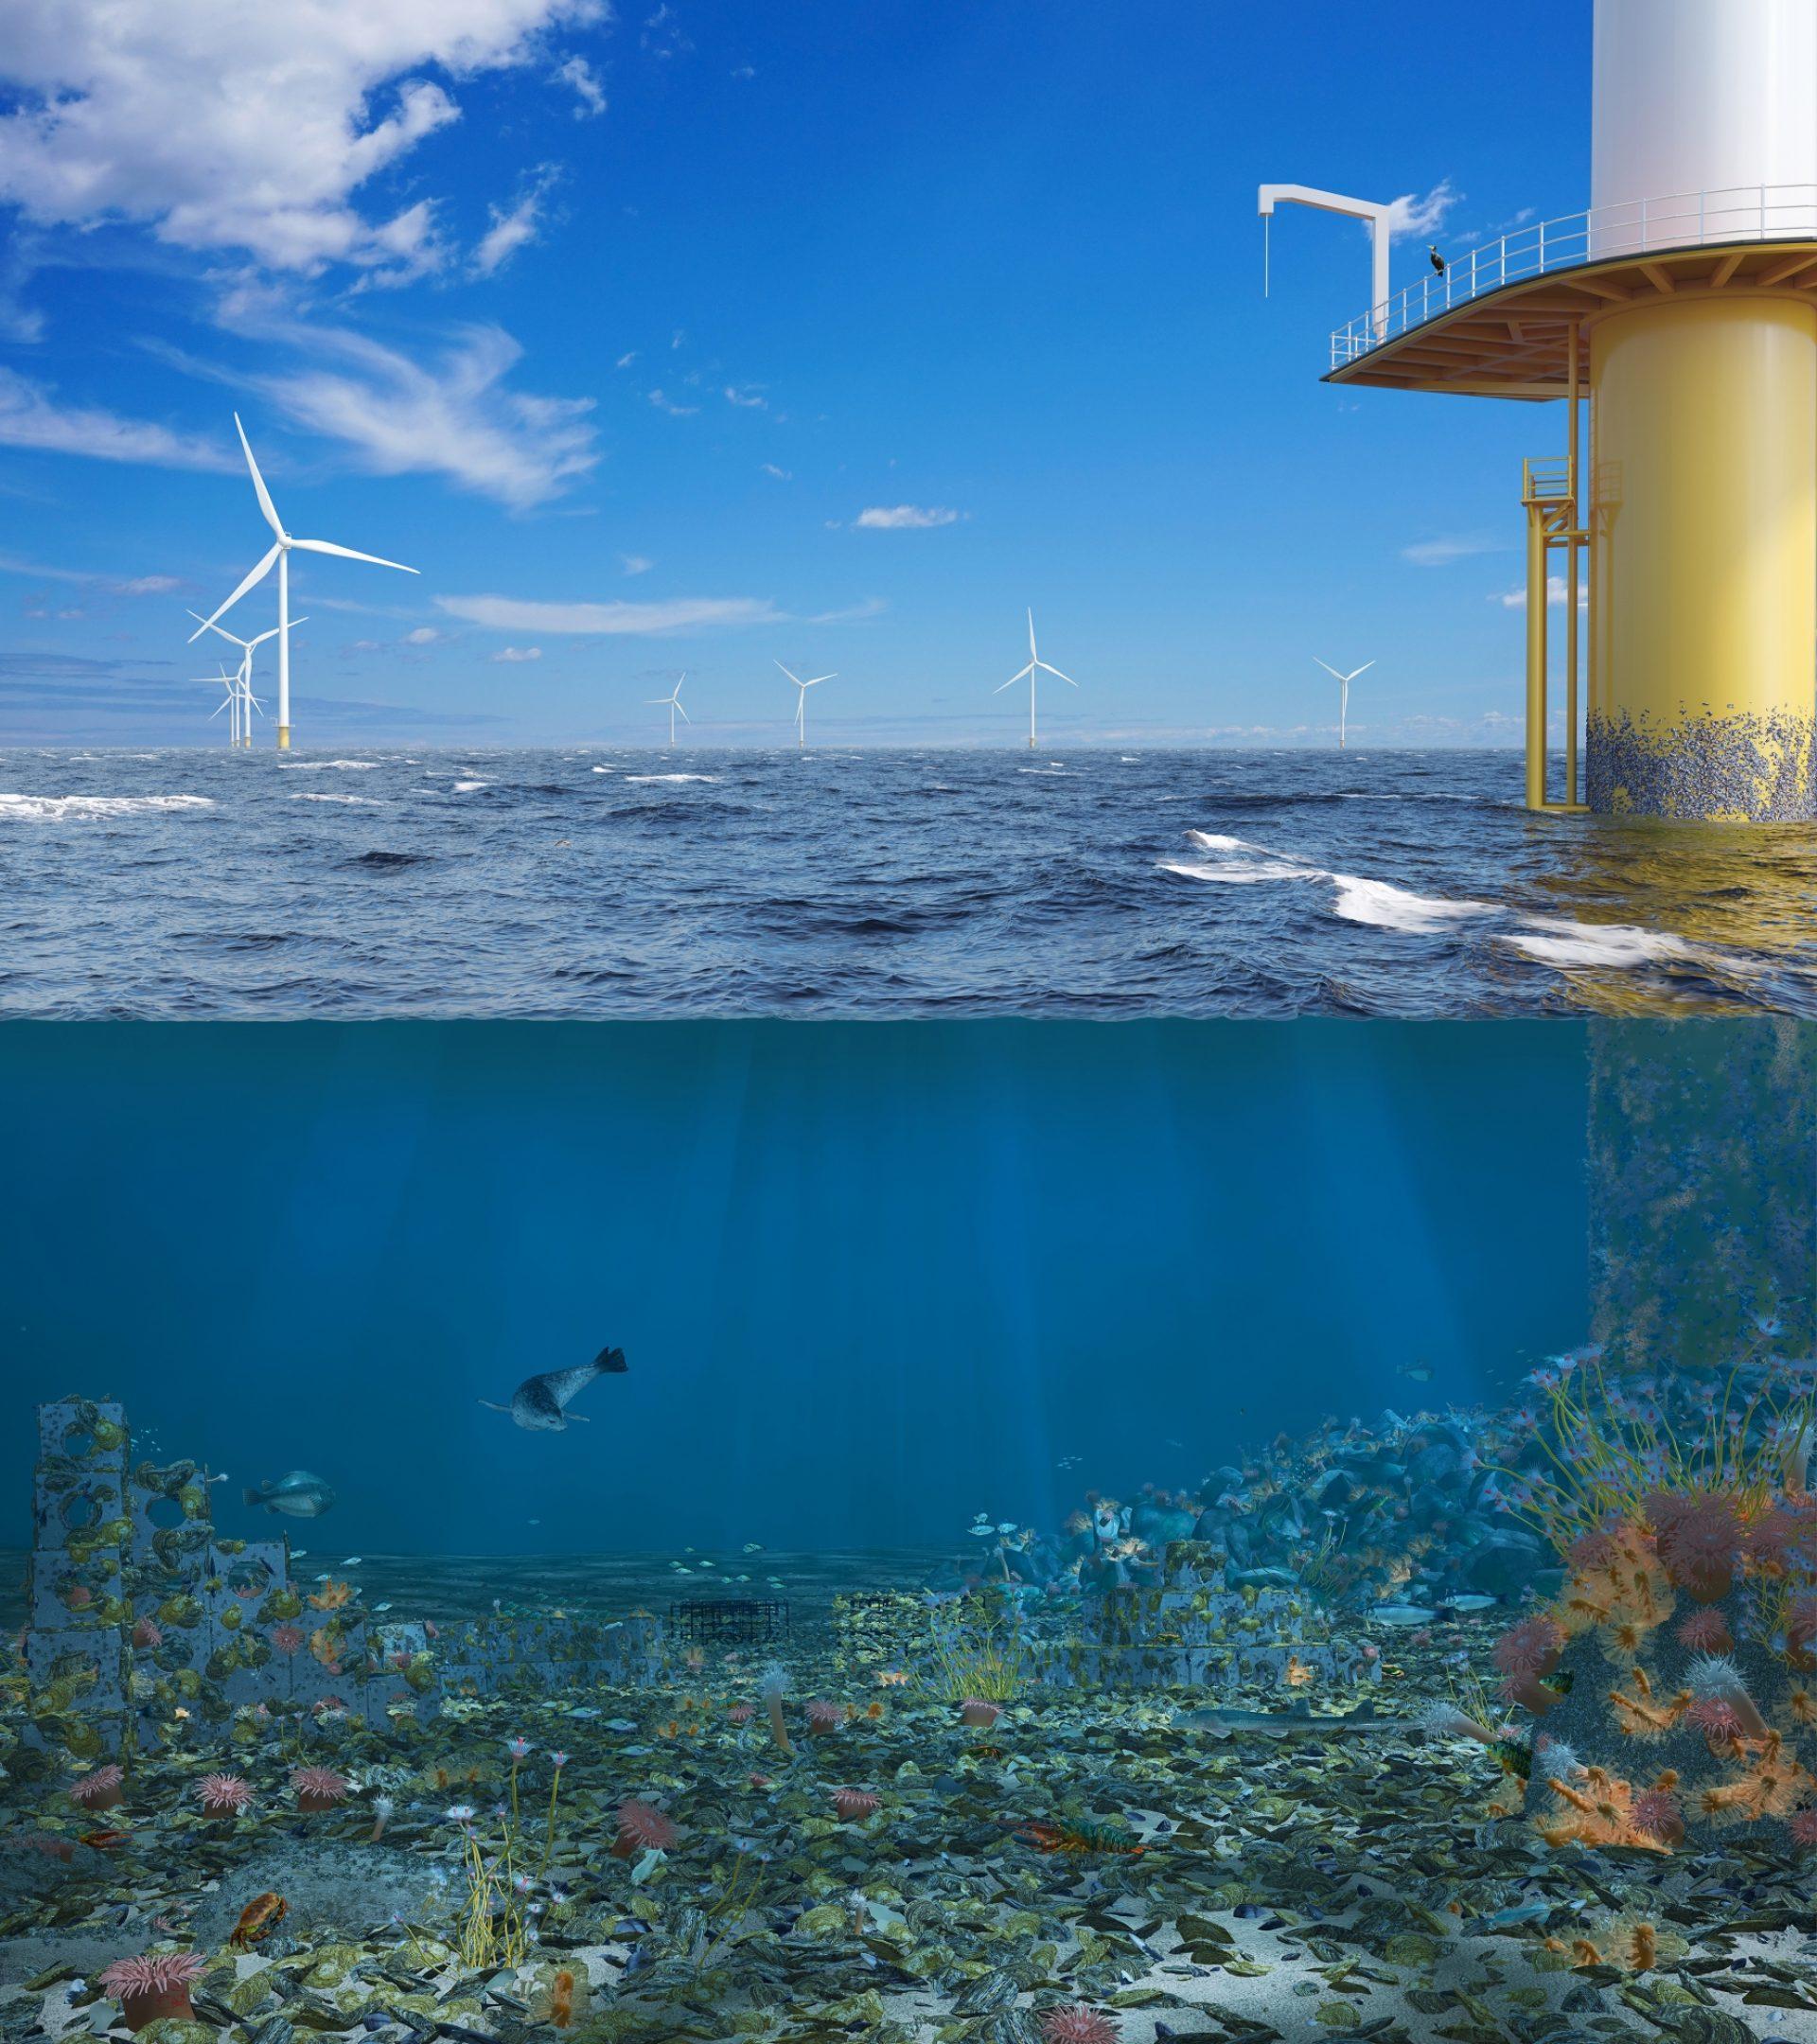 De Rijke Noordzee Offshore Quarter size